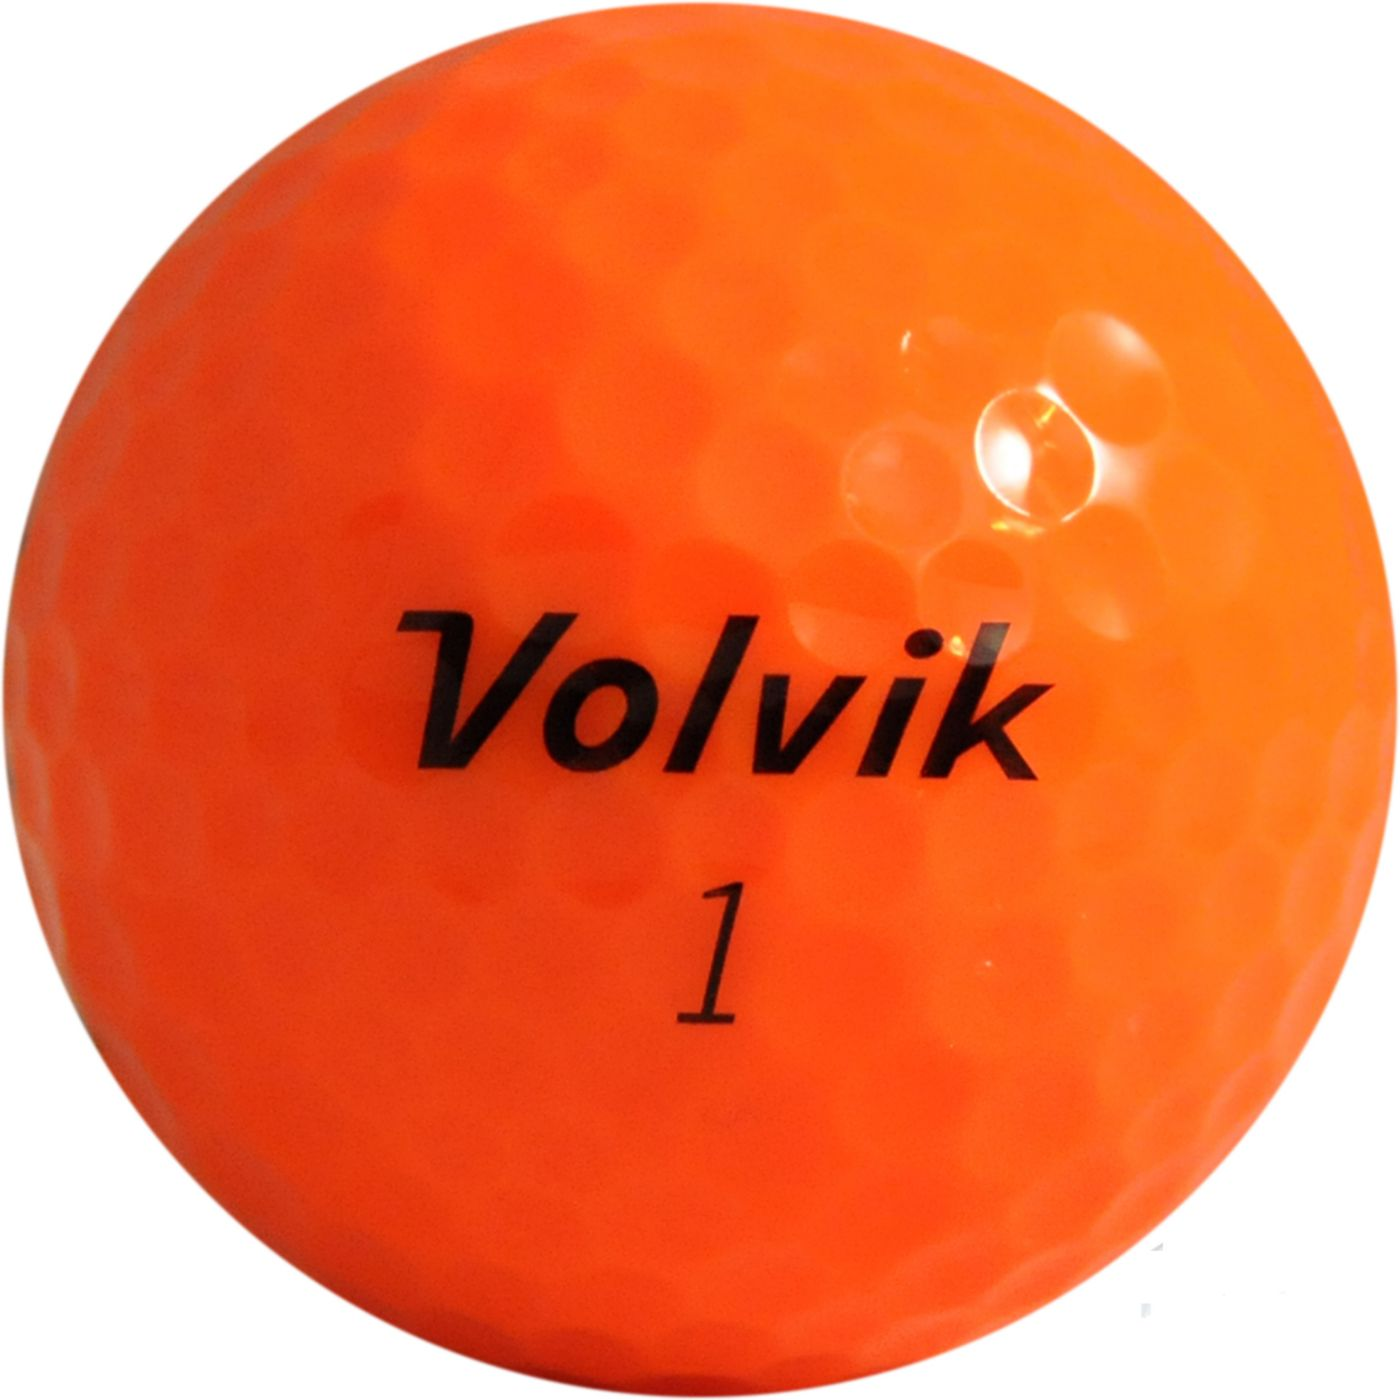 Volvik DS 55 Orange Personalized Golf Balls